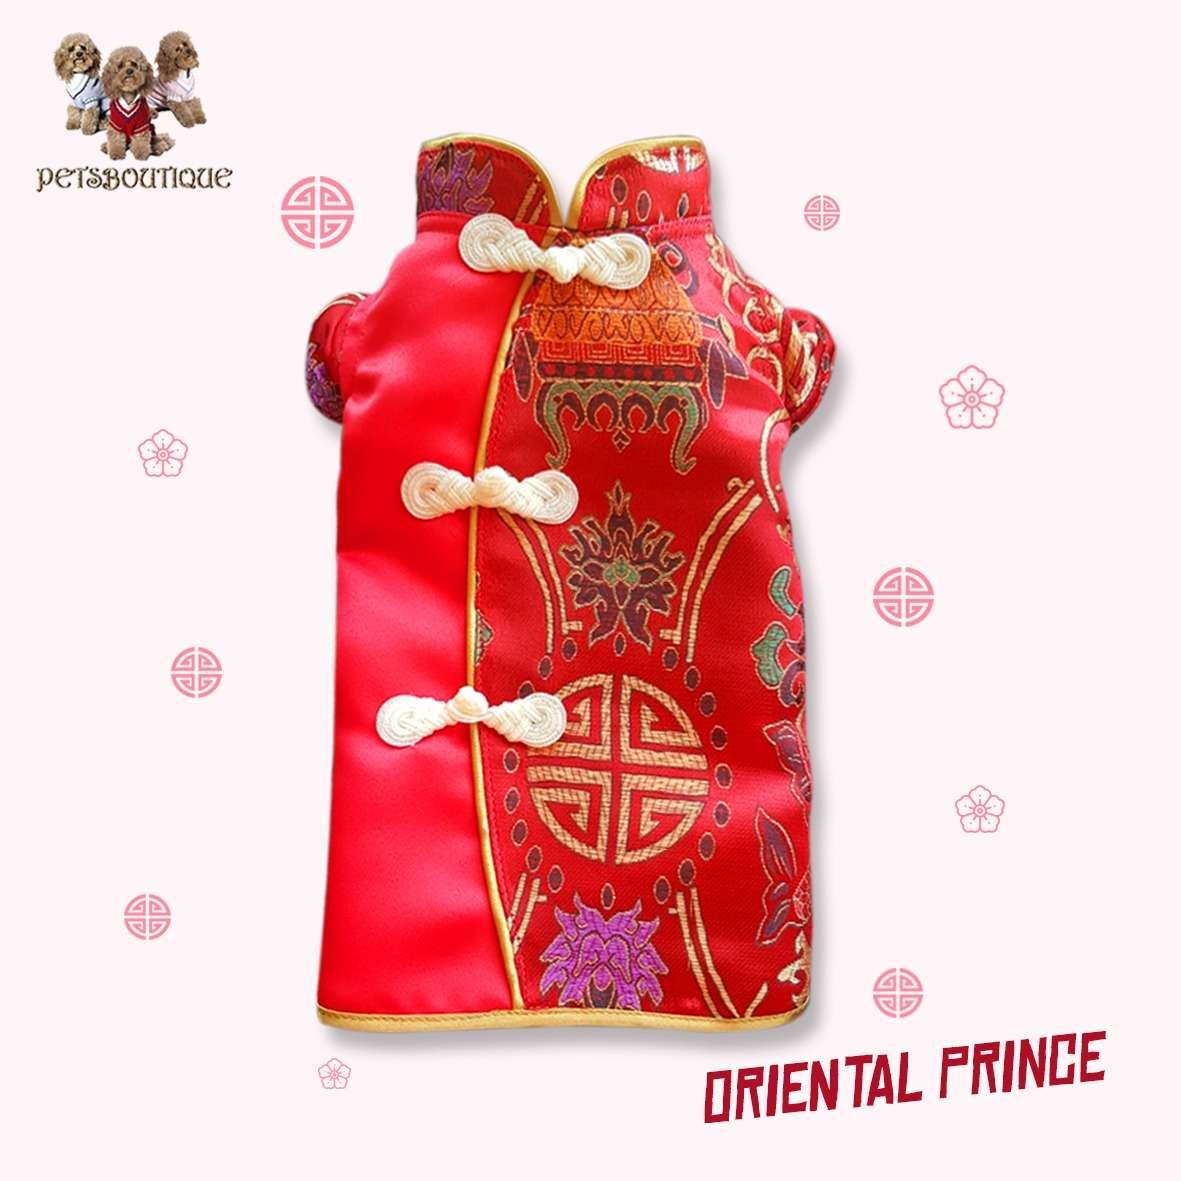 Petza - Chinese New Year Oriental - Prince Photo